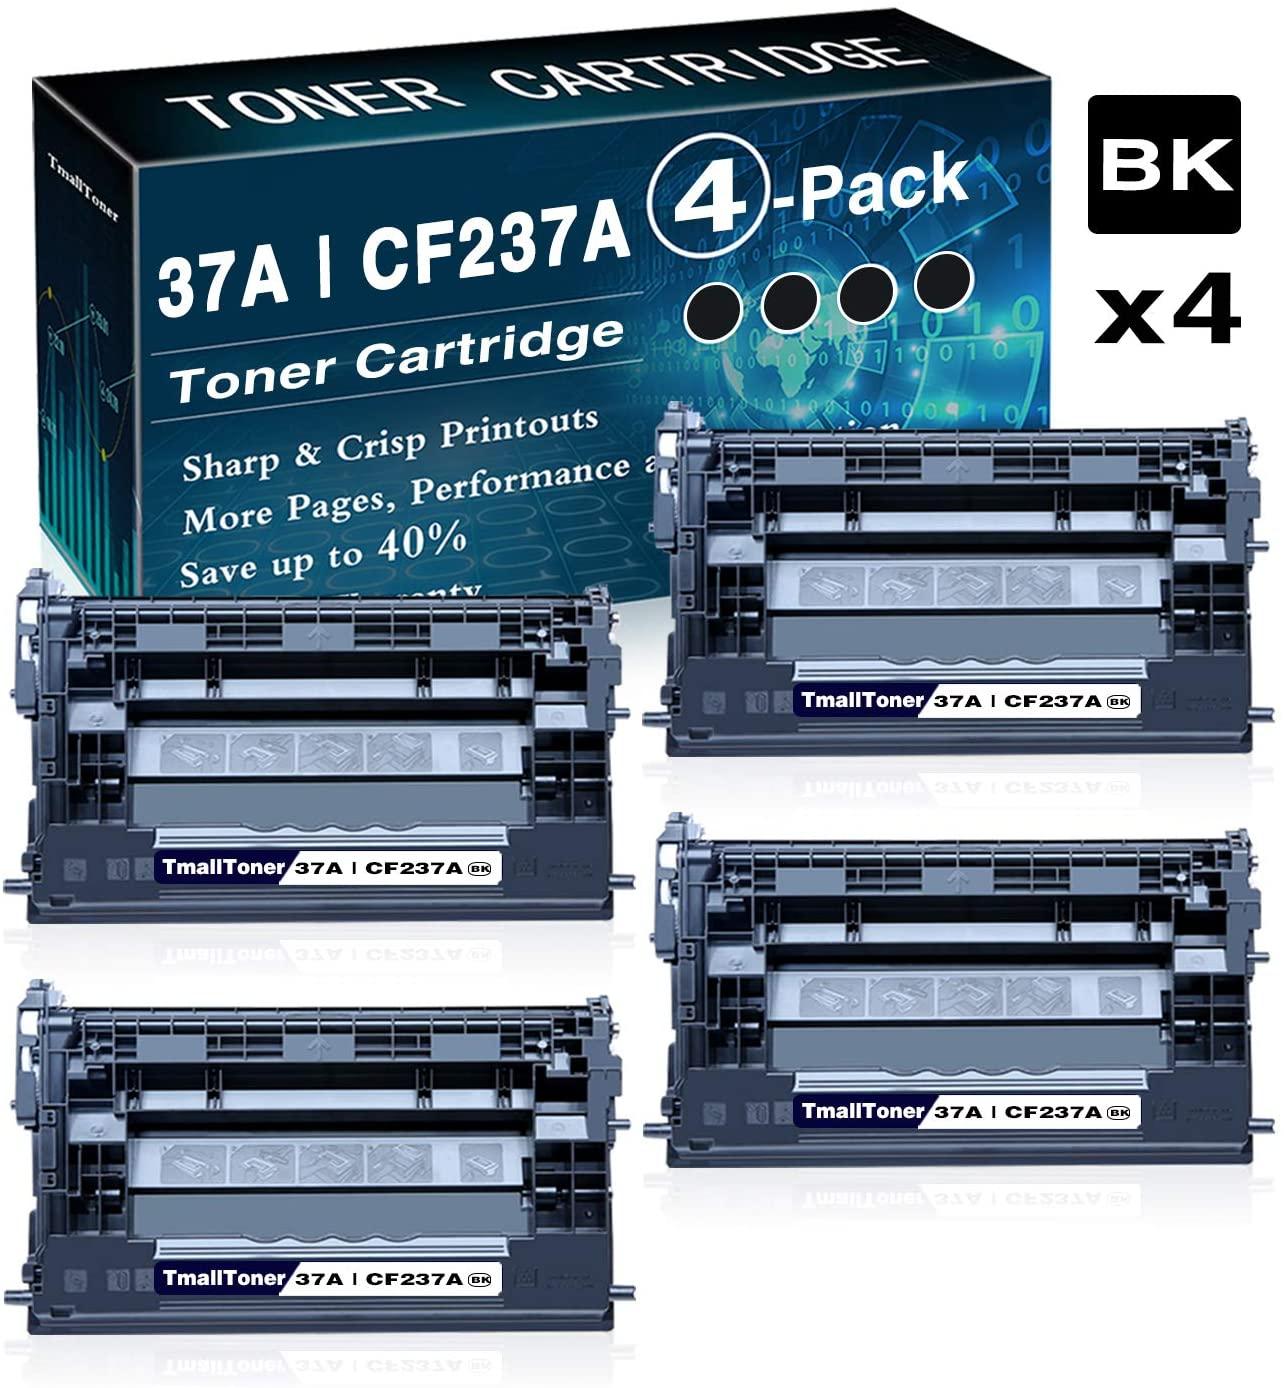 4 Pack High Yield 37A   CF237A Black Toner Cartridge Replacement for HP Laserjet M607n M607dn M608dn MFP M631dn MFP M632fht MFP M633fh M607 Series Printer,by TmallToner